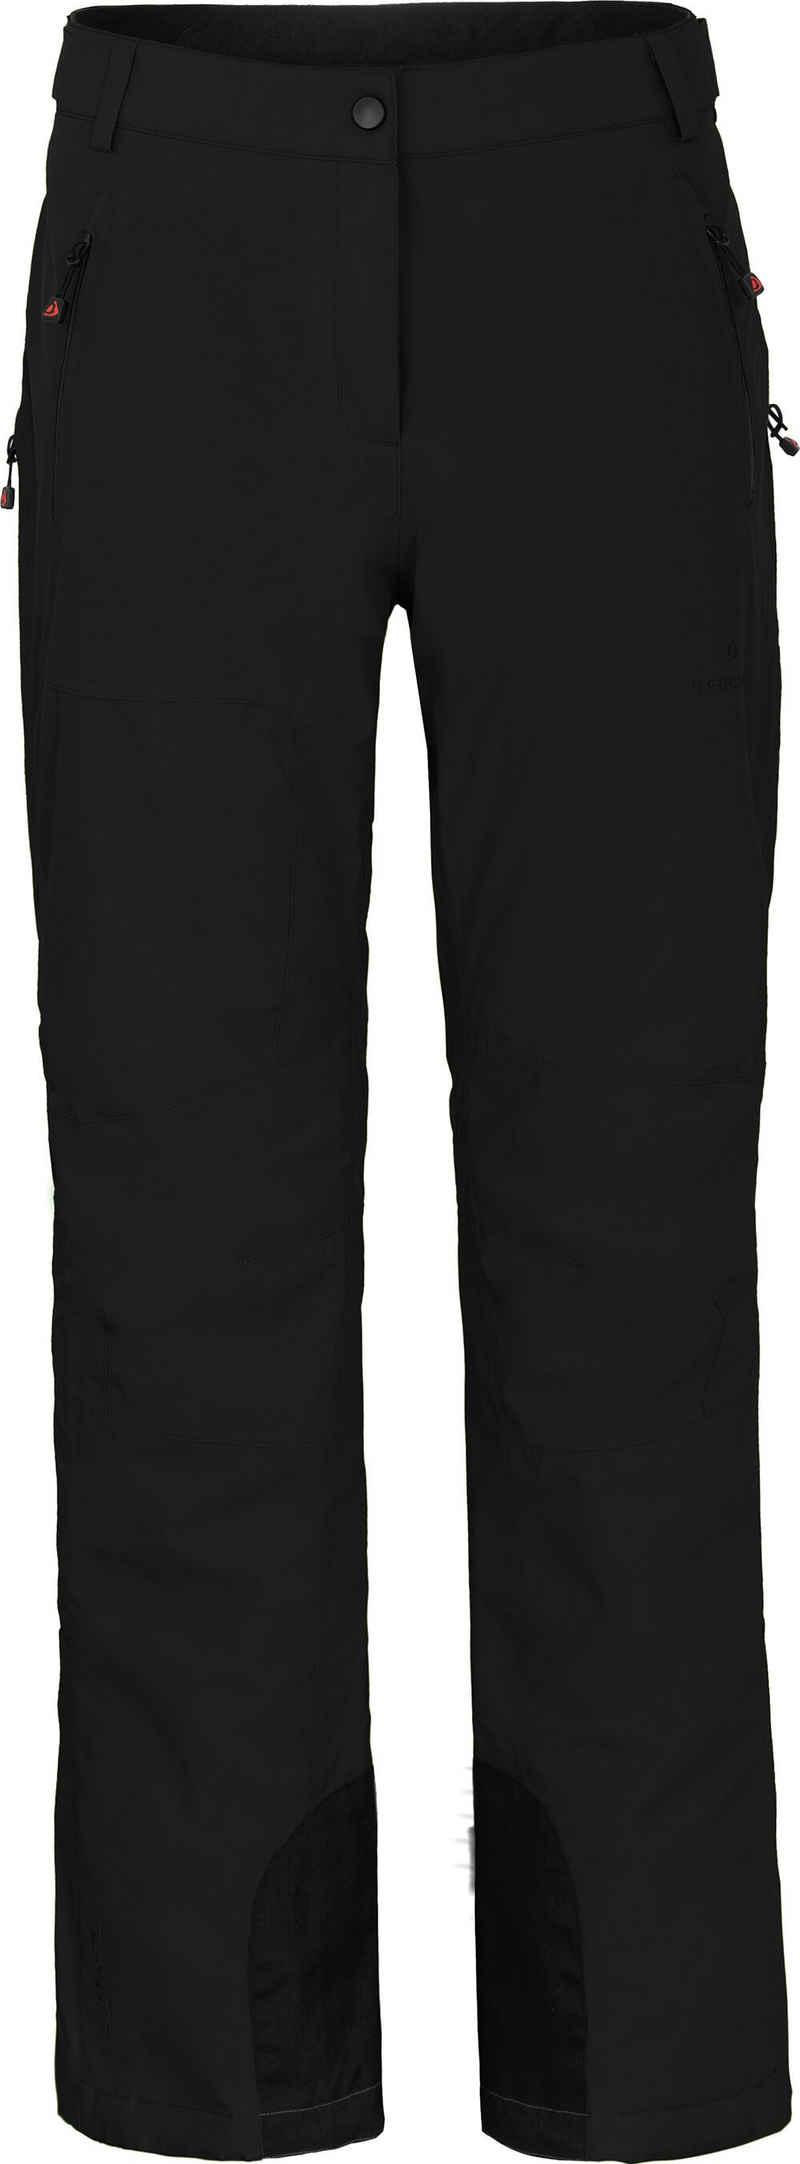 Bergson Skihose »ICE« Damen Skihose, wattiert, 20000 mm Wassersäule, Kurzgrößen, schwarz